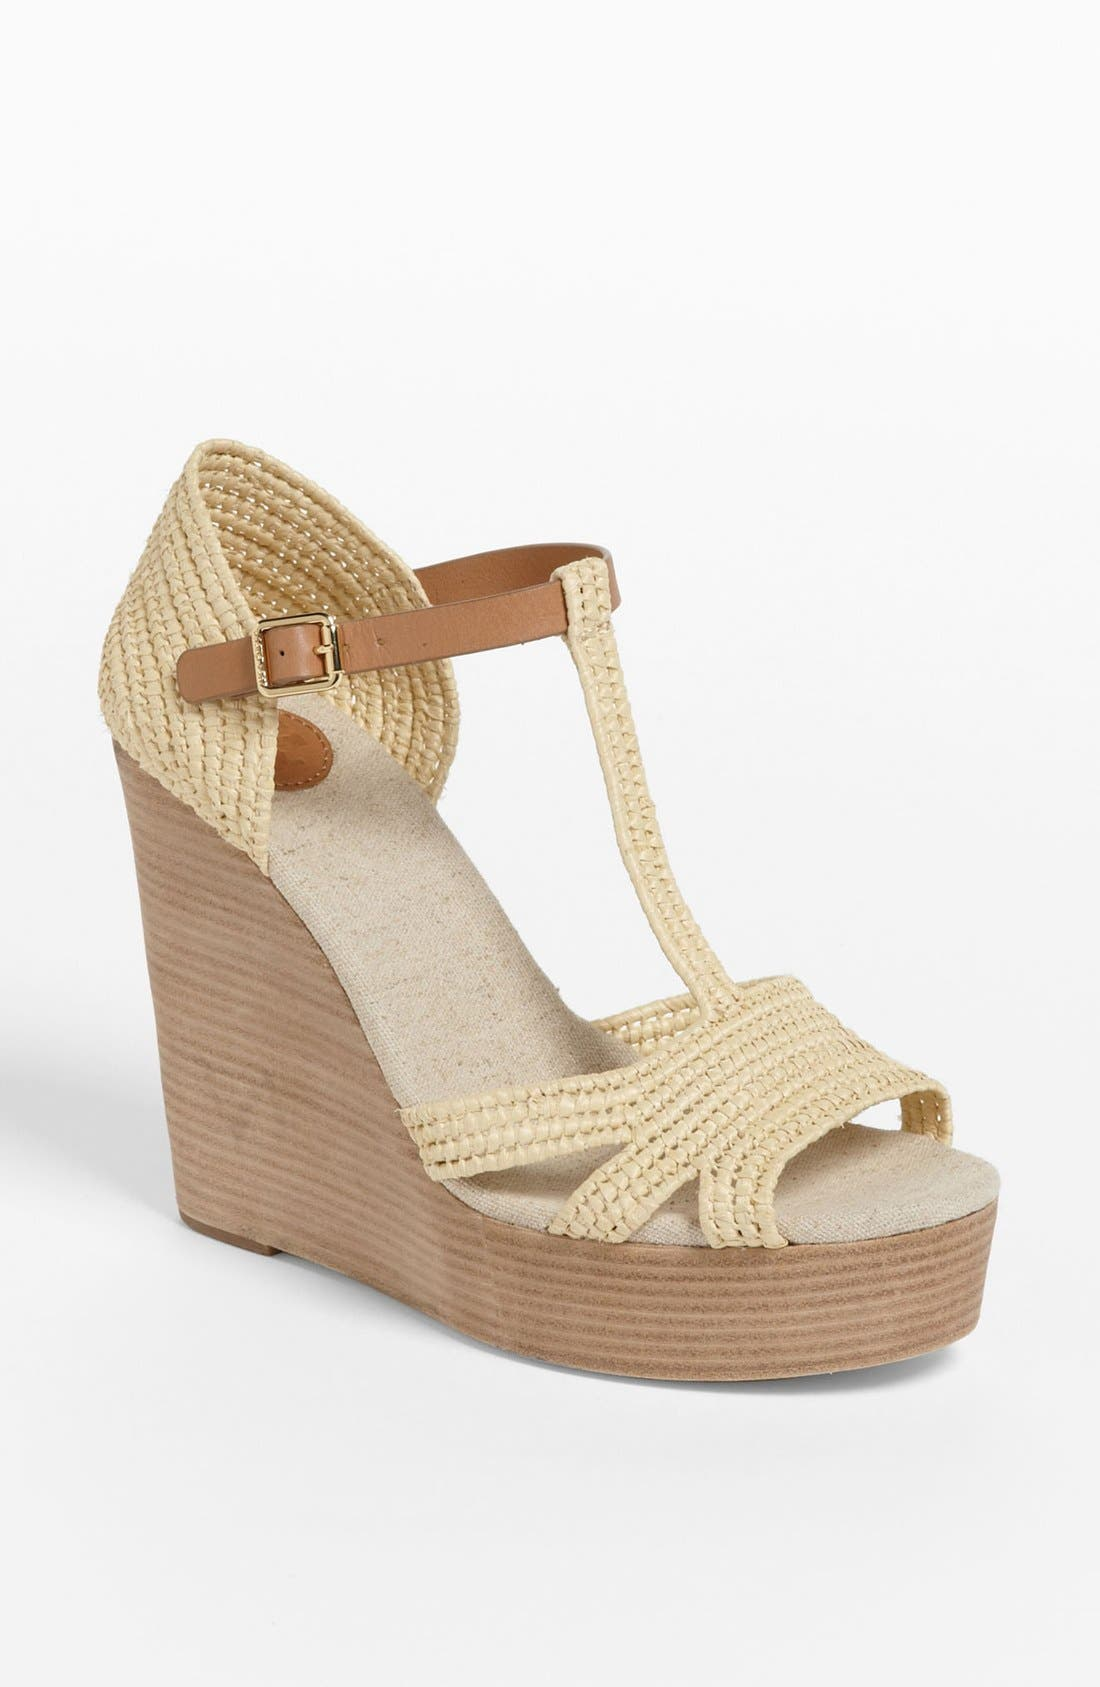 Alternate Image 1 Selected - Tory Burch 'Carina' Wedge Sandal